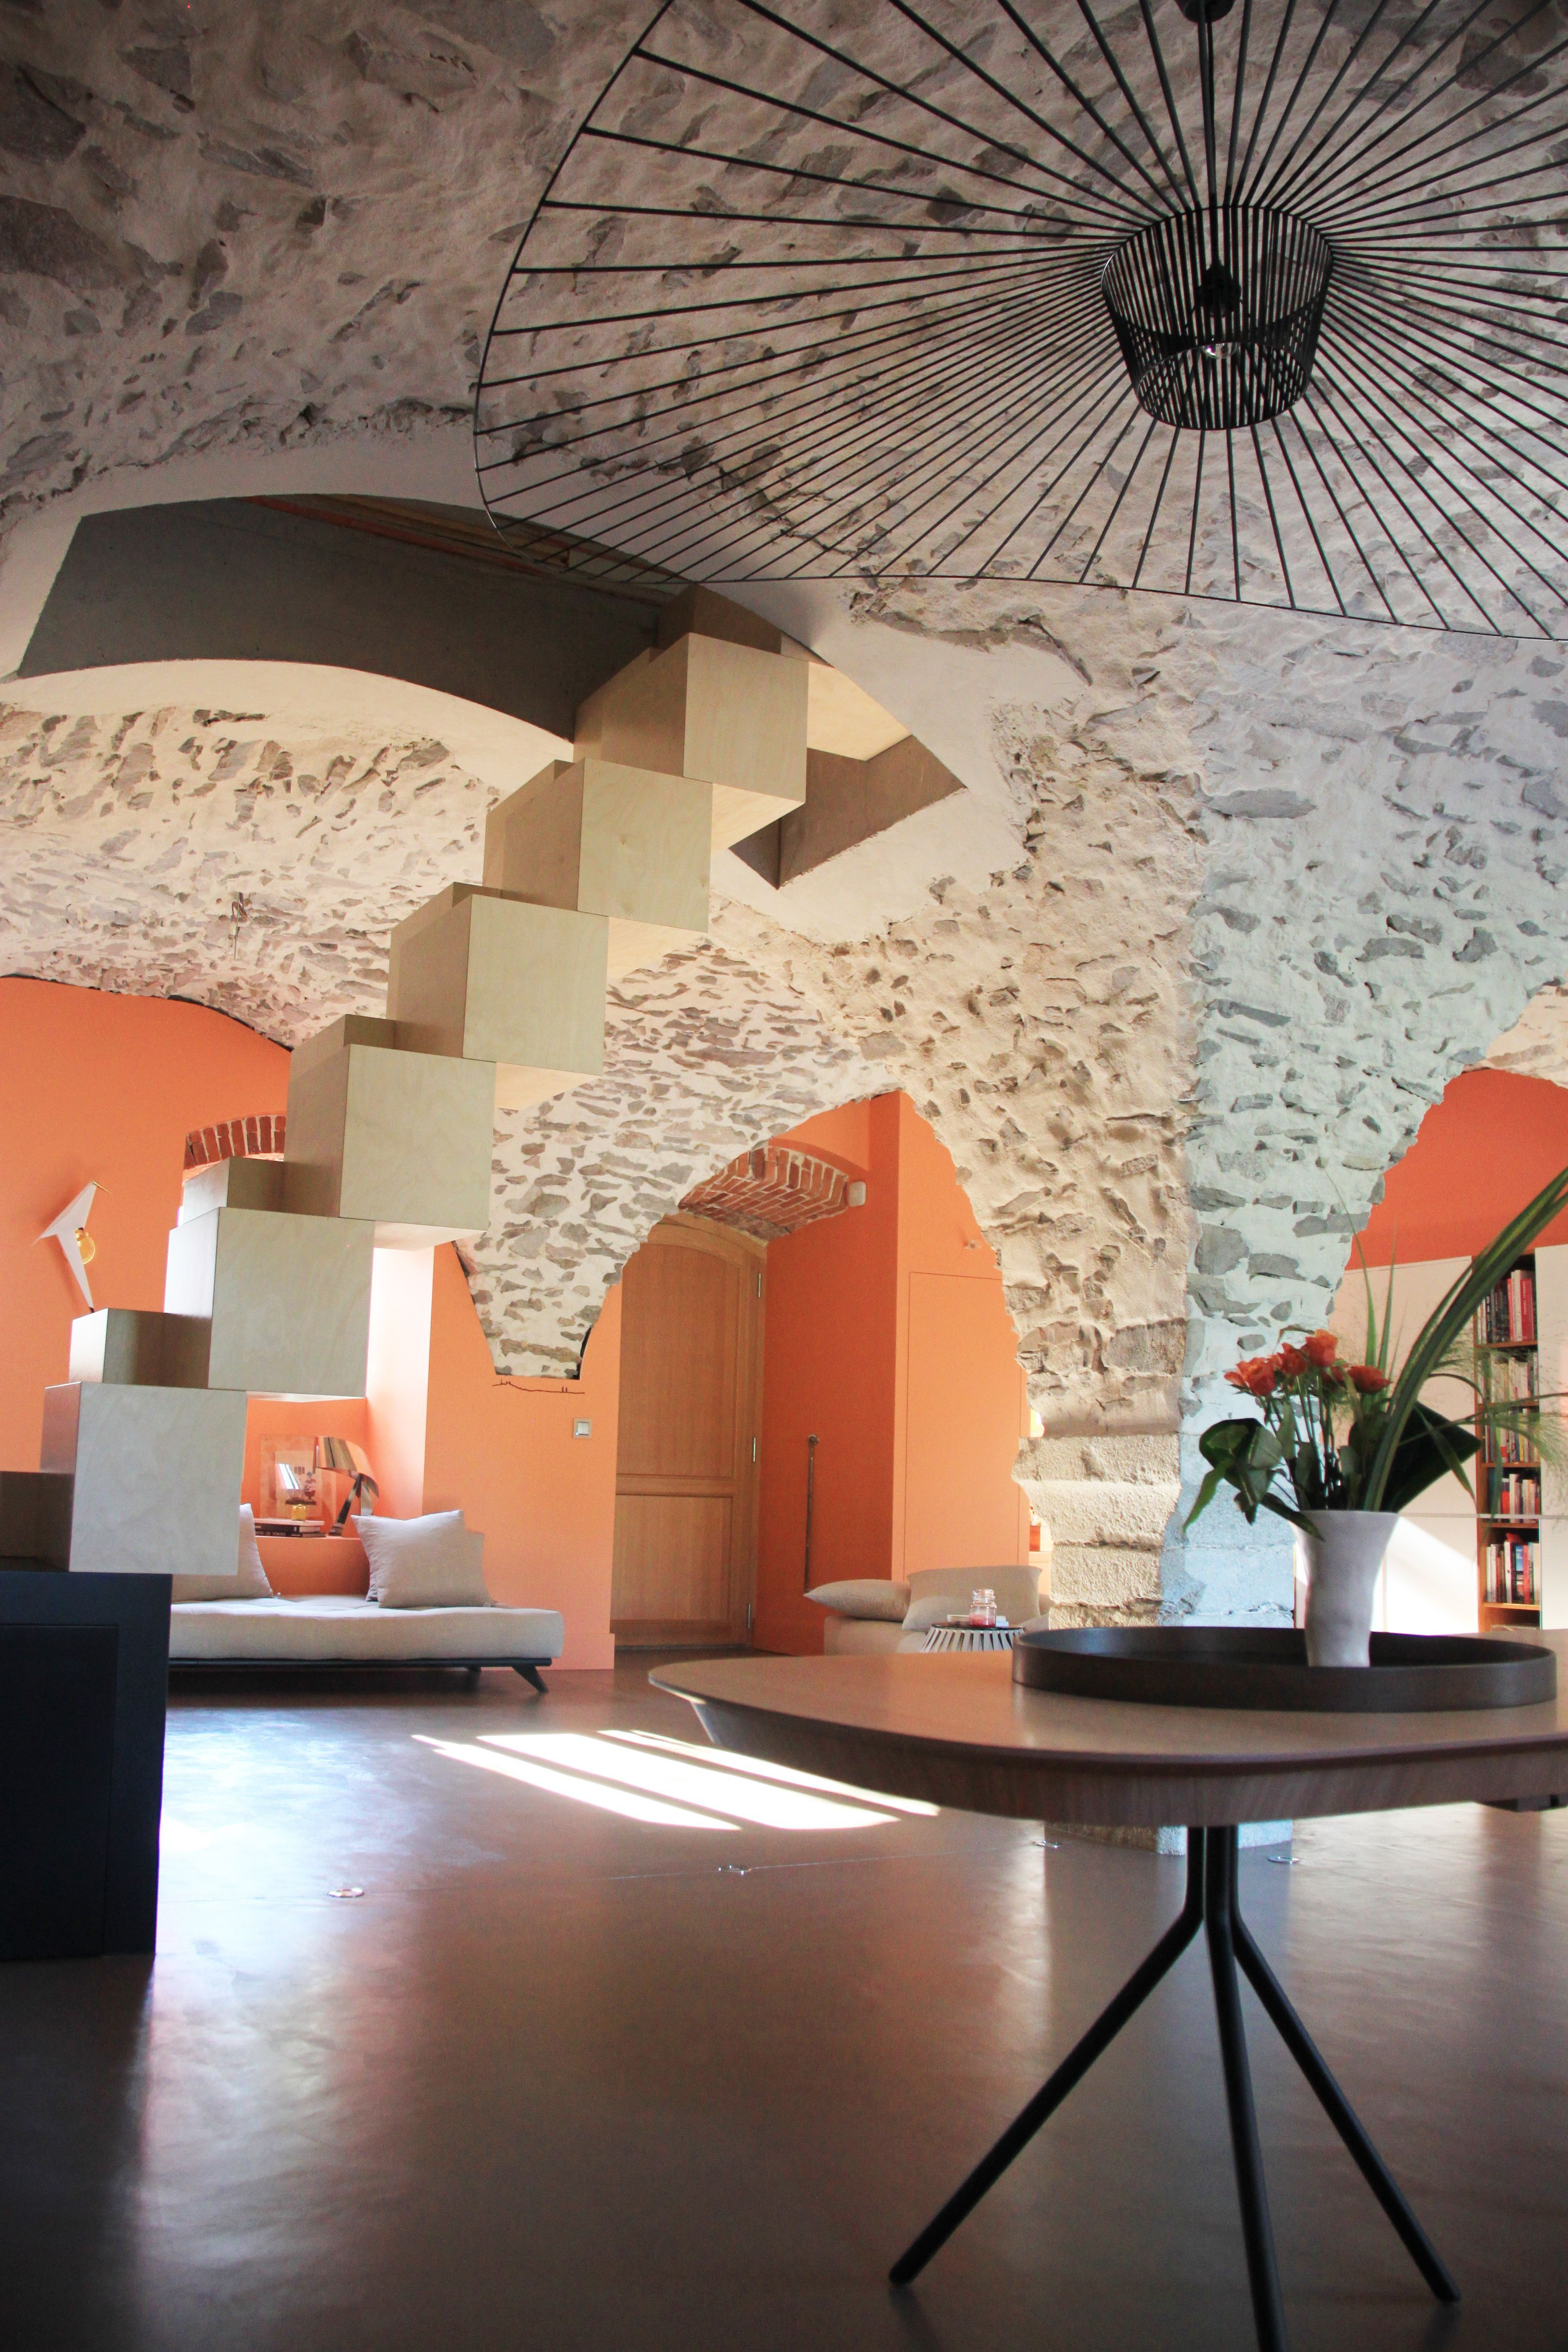 Beautiful Beton Cire Exterieur Castorama Dining Table Printed Rugs Interior Design